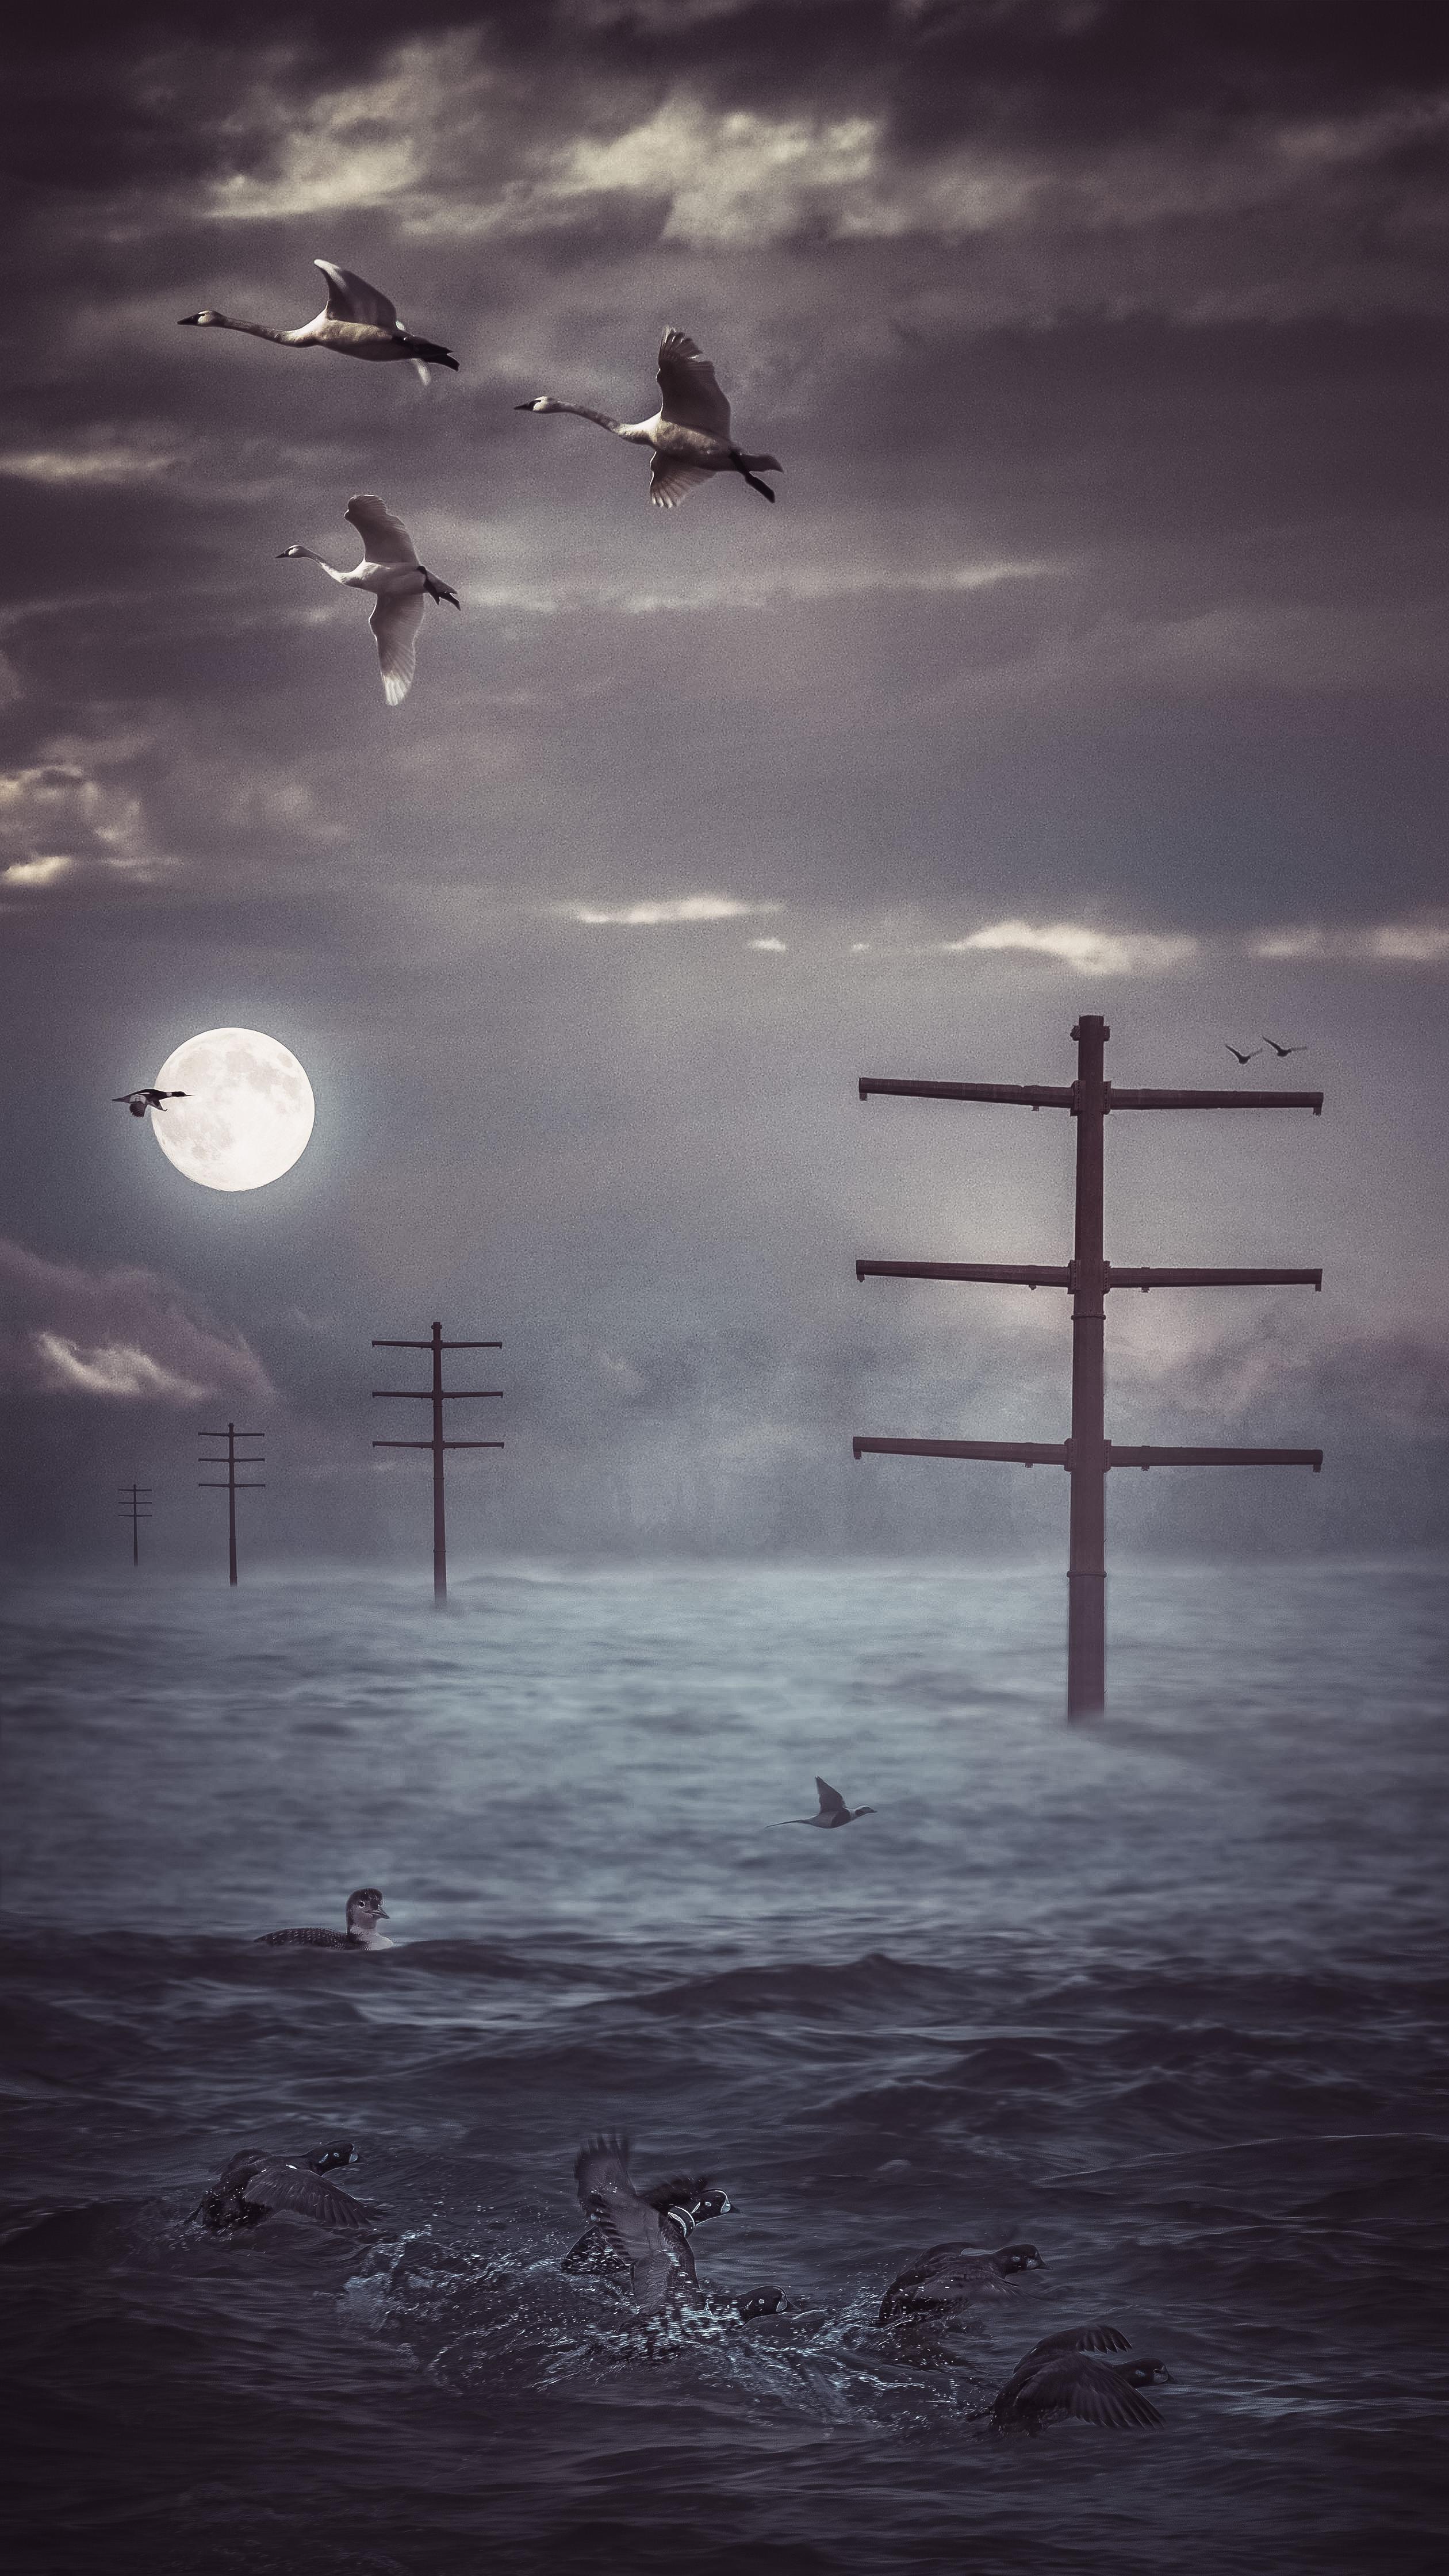 The Pylons Still Stood - Rose Anderson